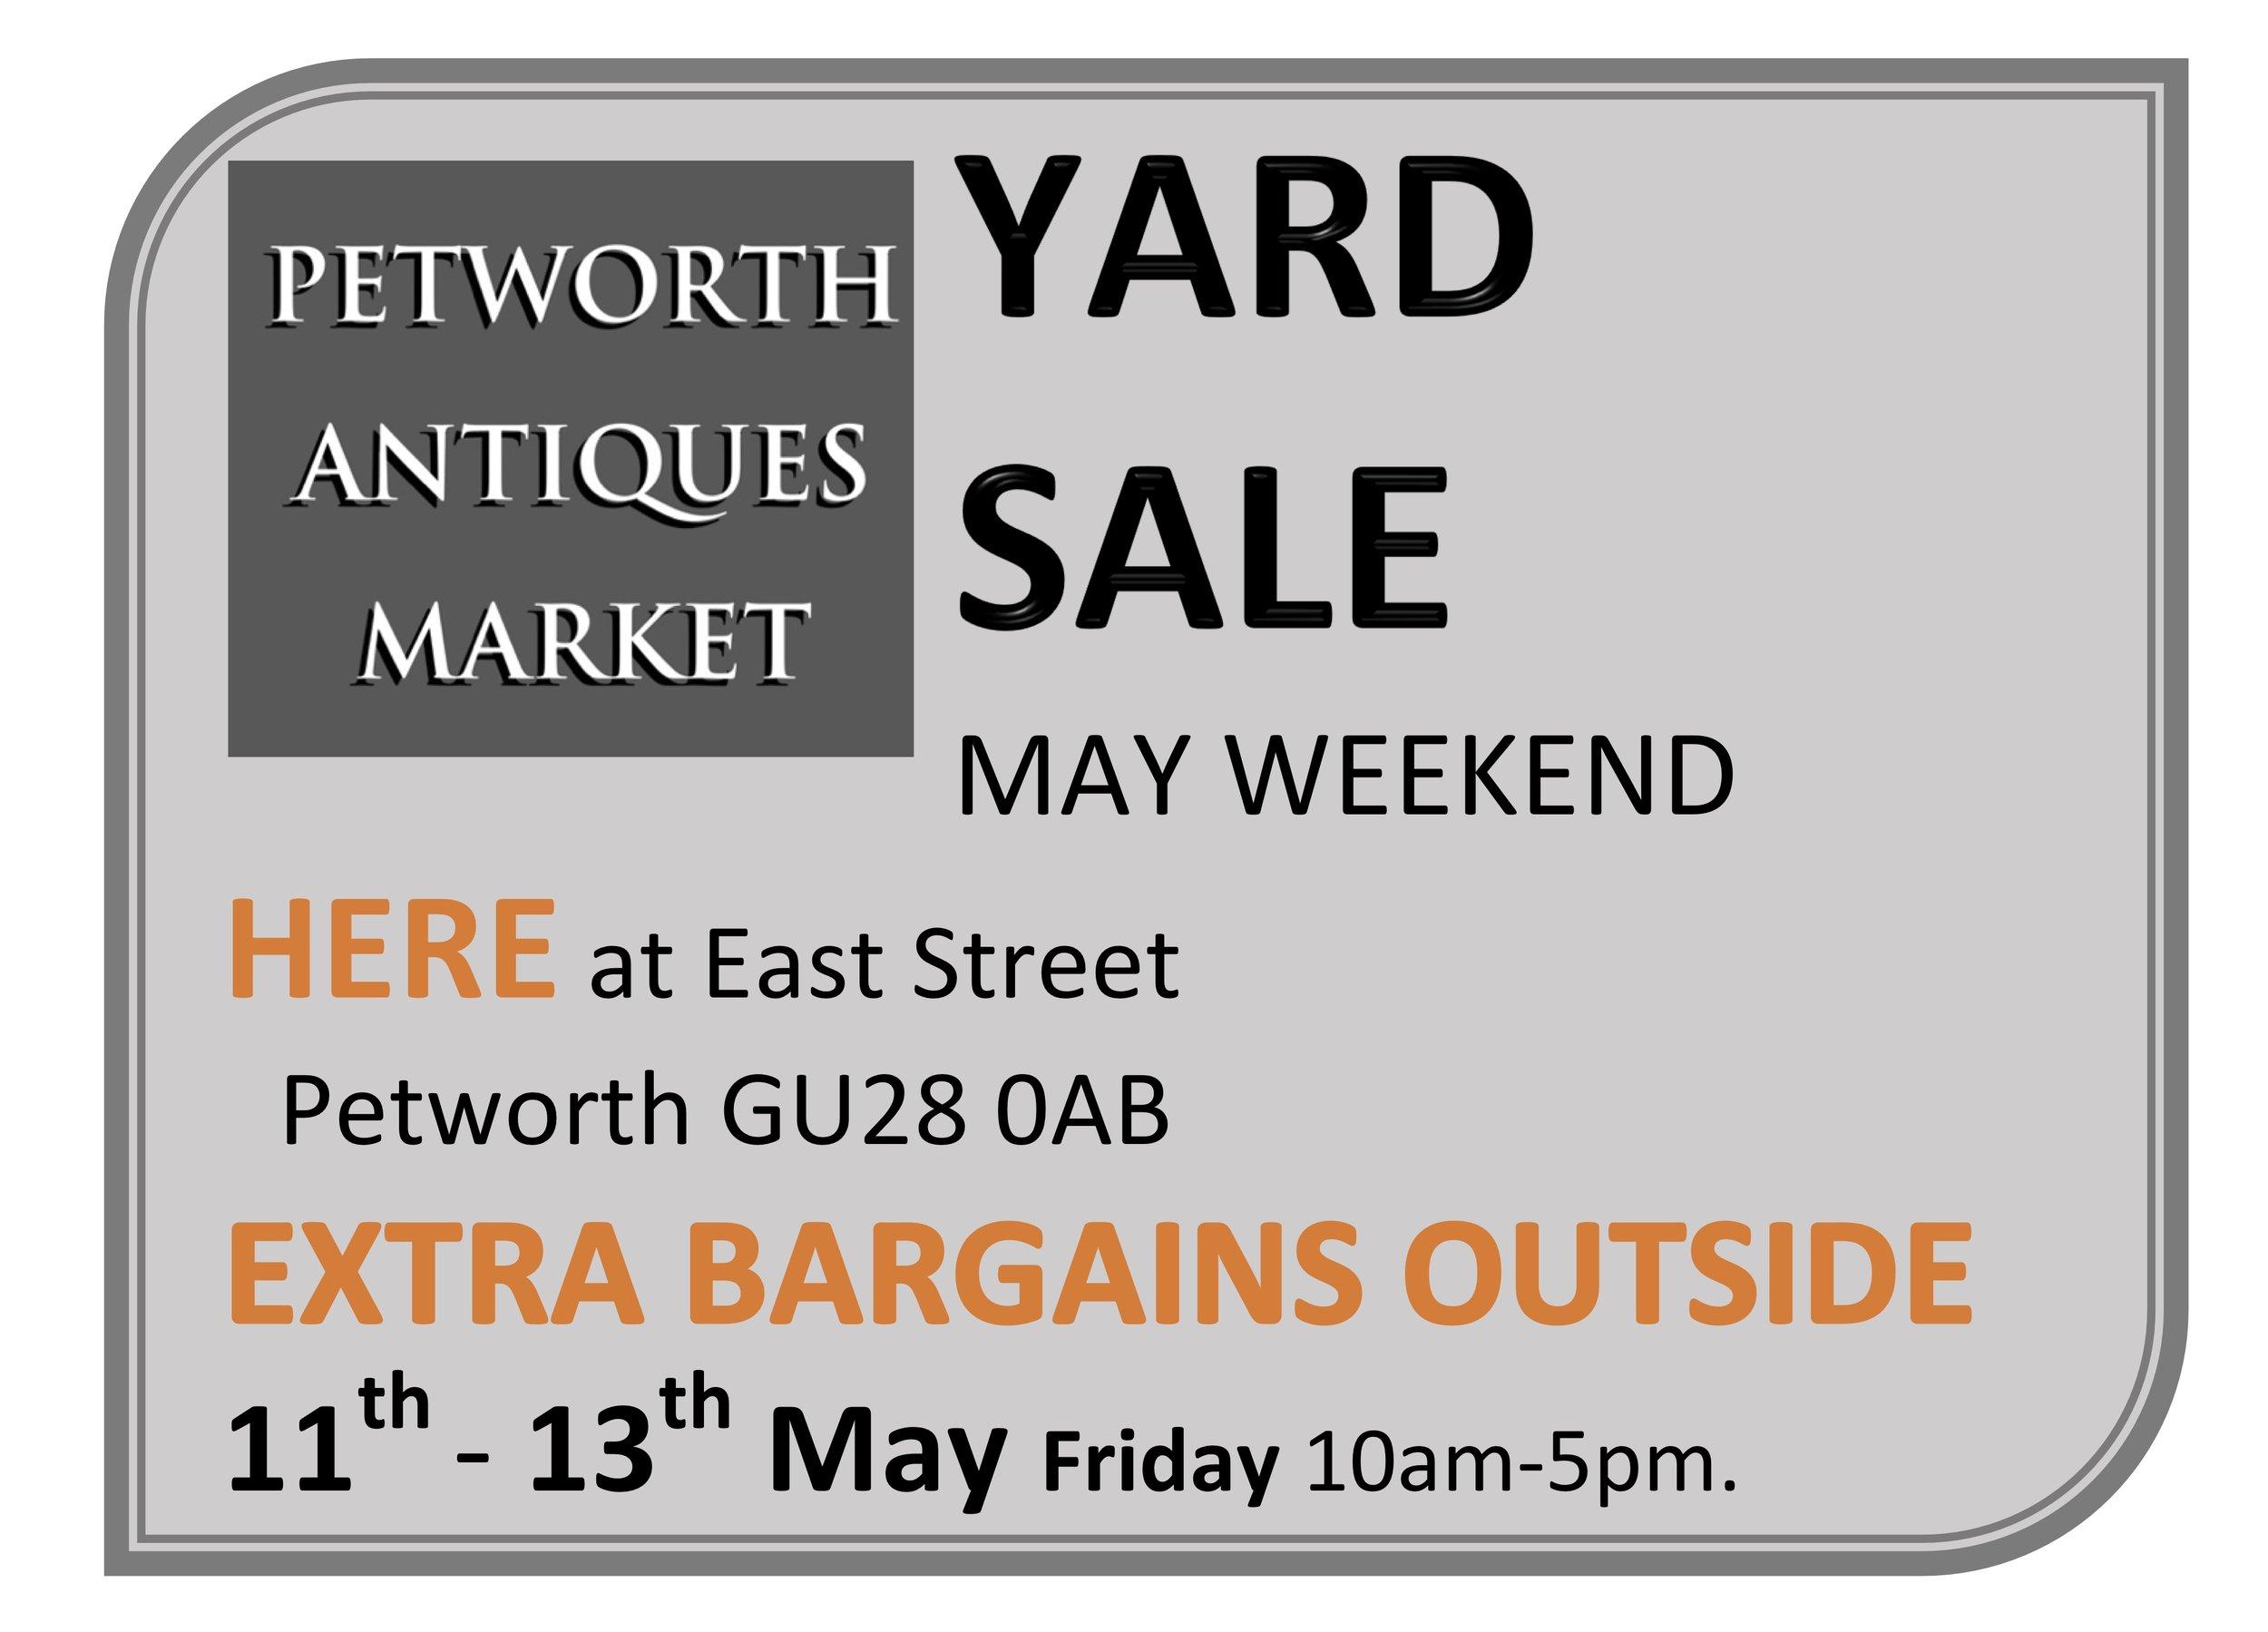 Yard Sale at Petworth Antiques Market